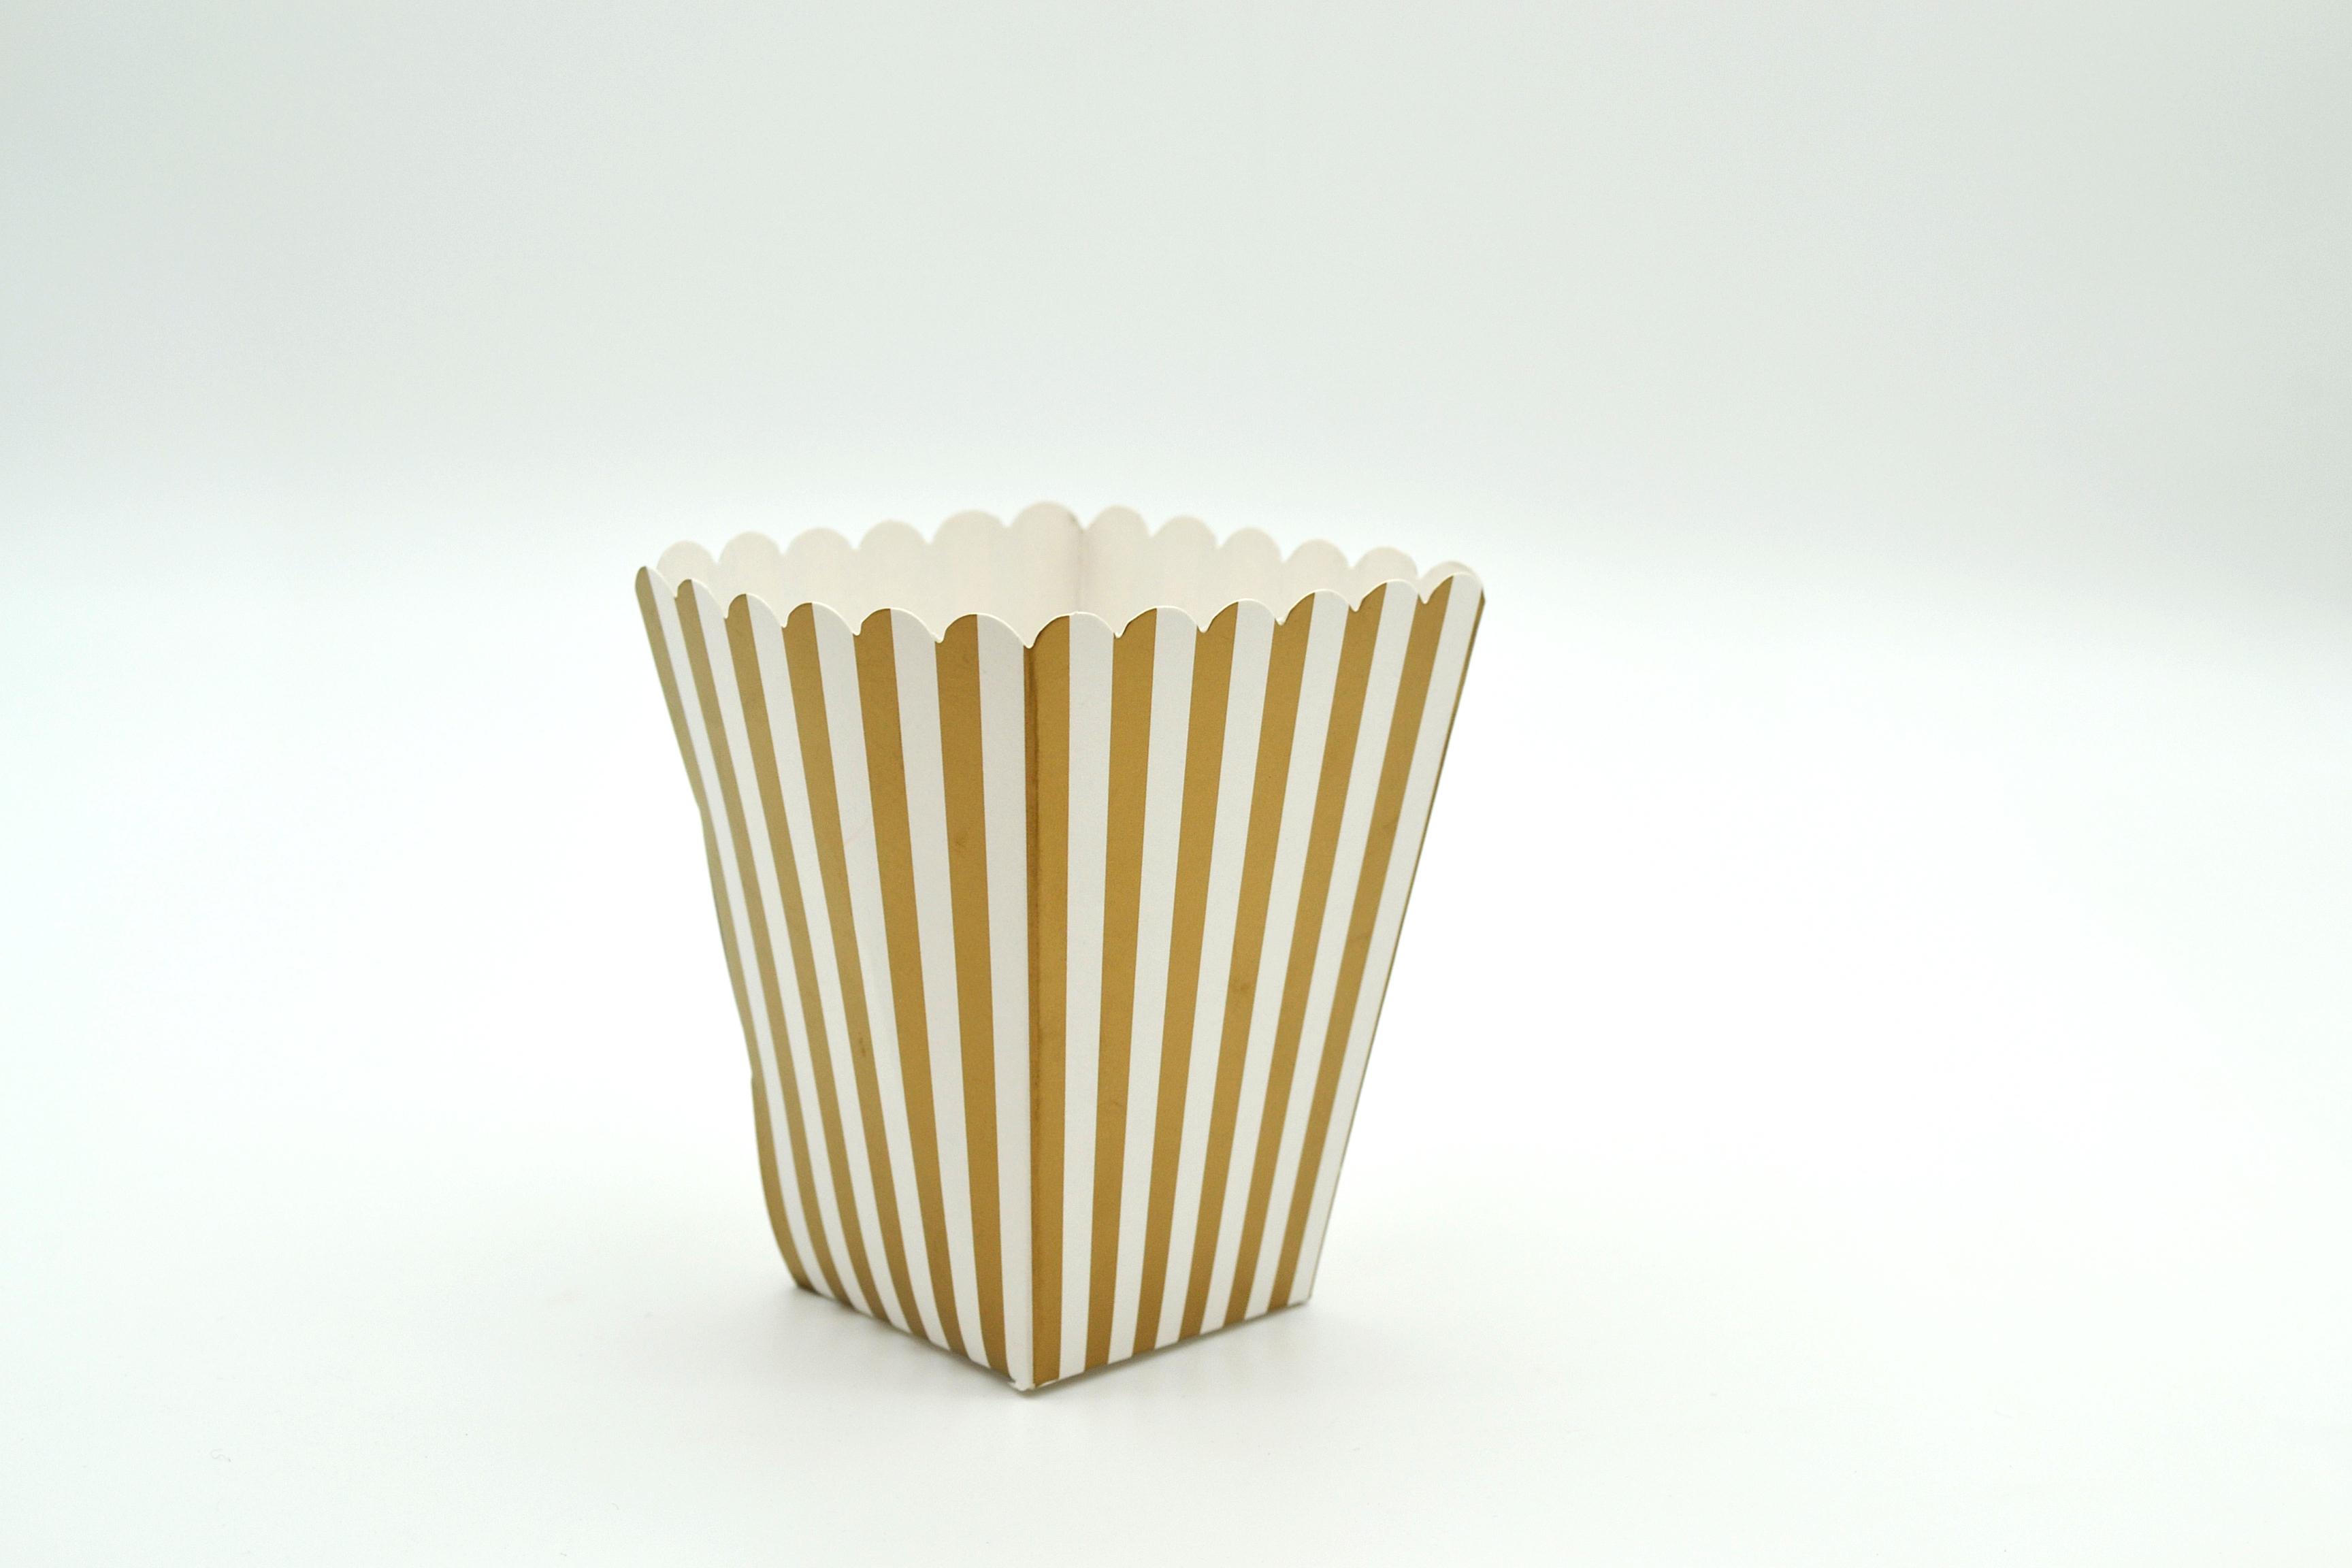 Box Popcorn Mini Gold 5 x 5 x 10 cm (each)